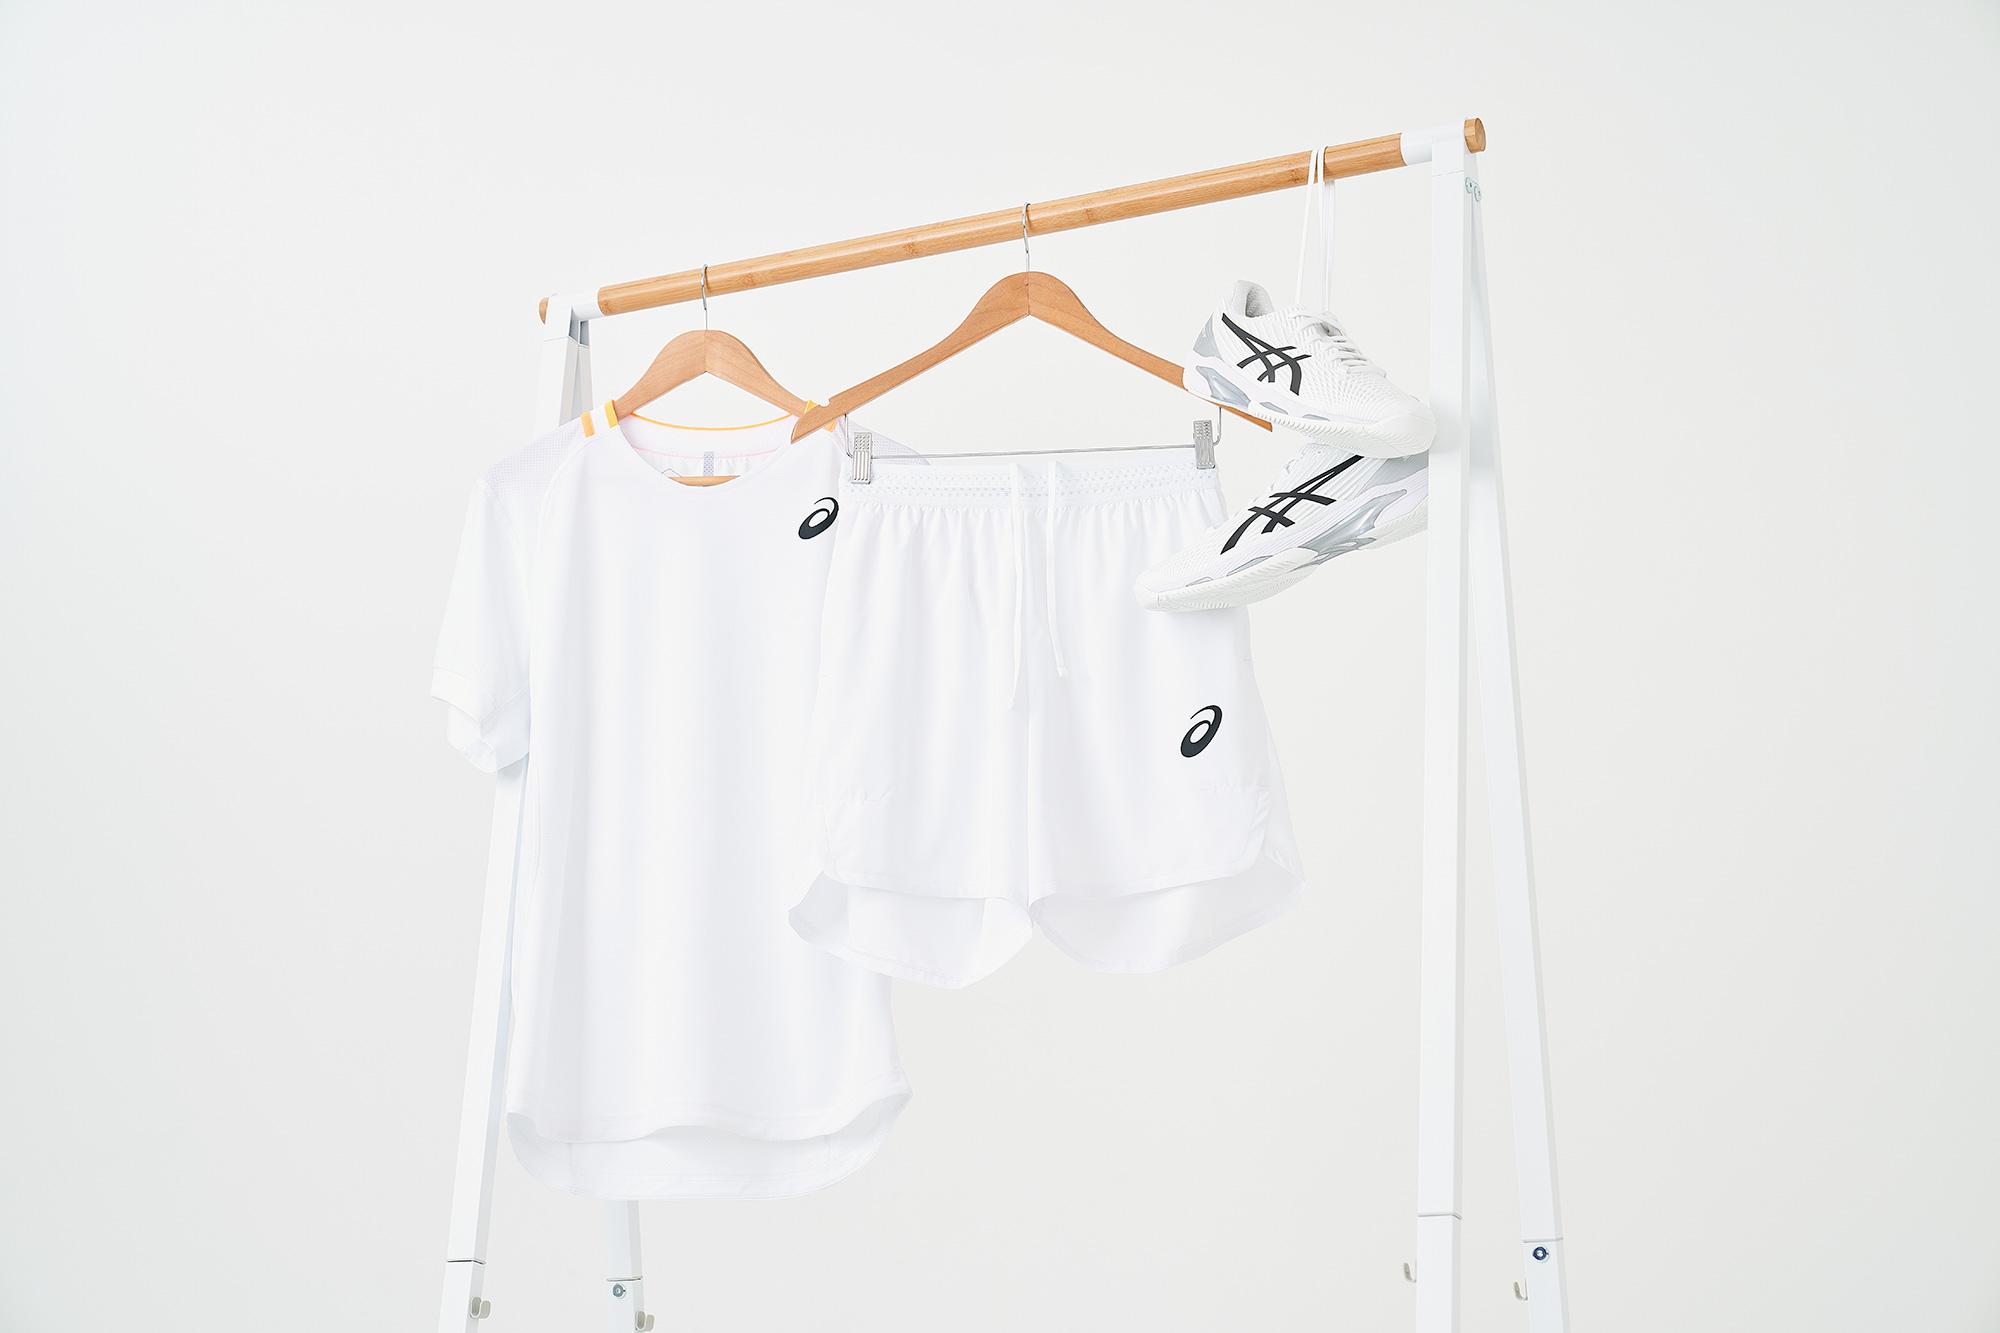 new asics Wimbledon tennis clothing photographed on white backdrop using sony camera